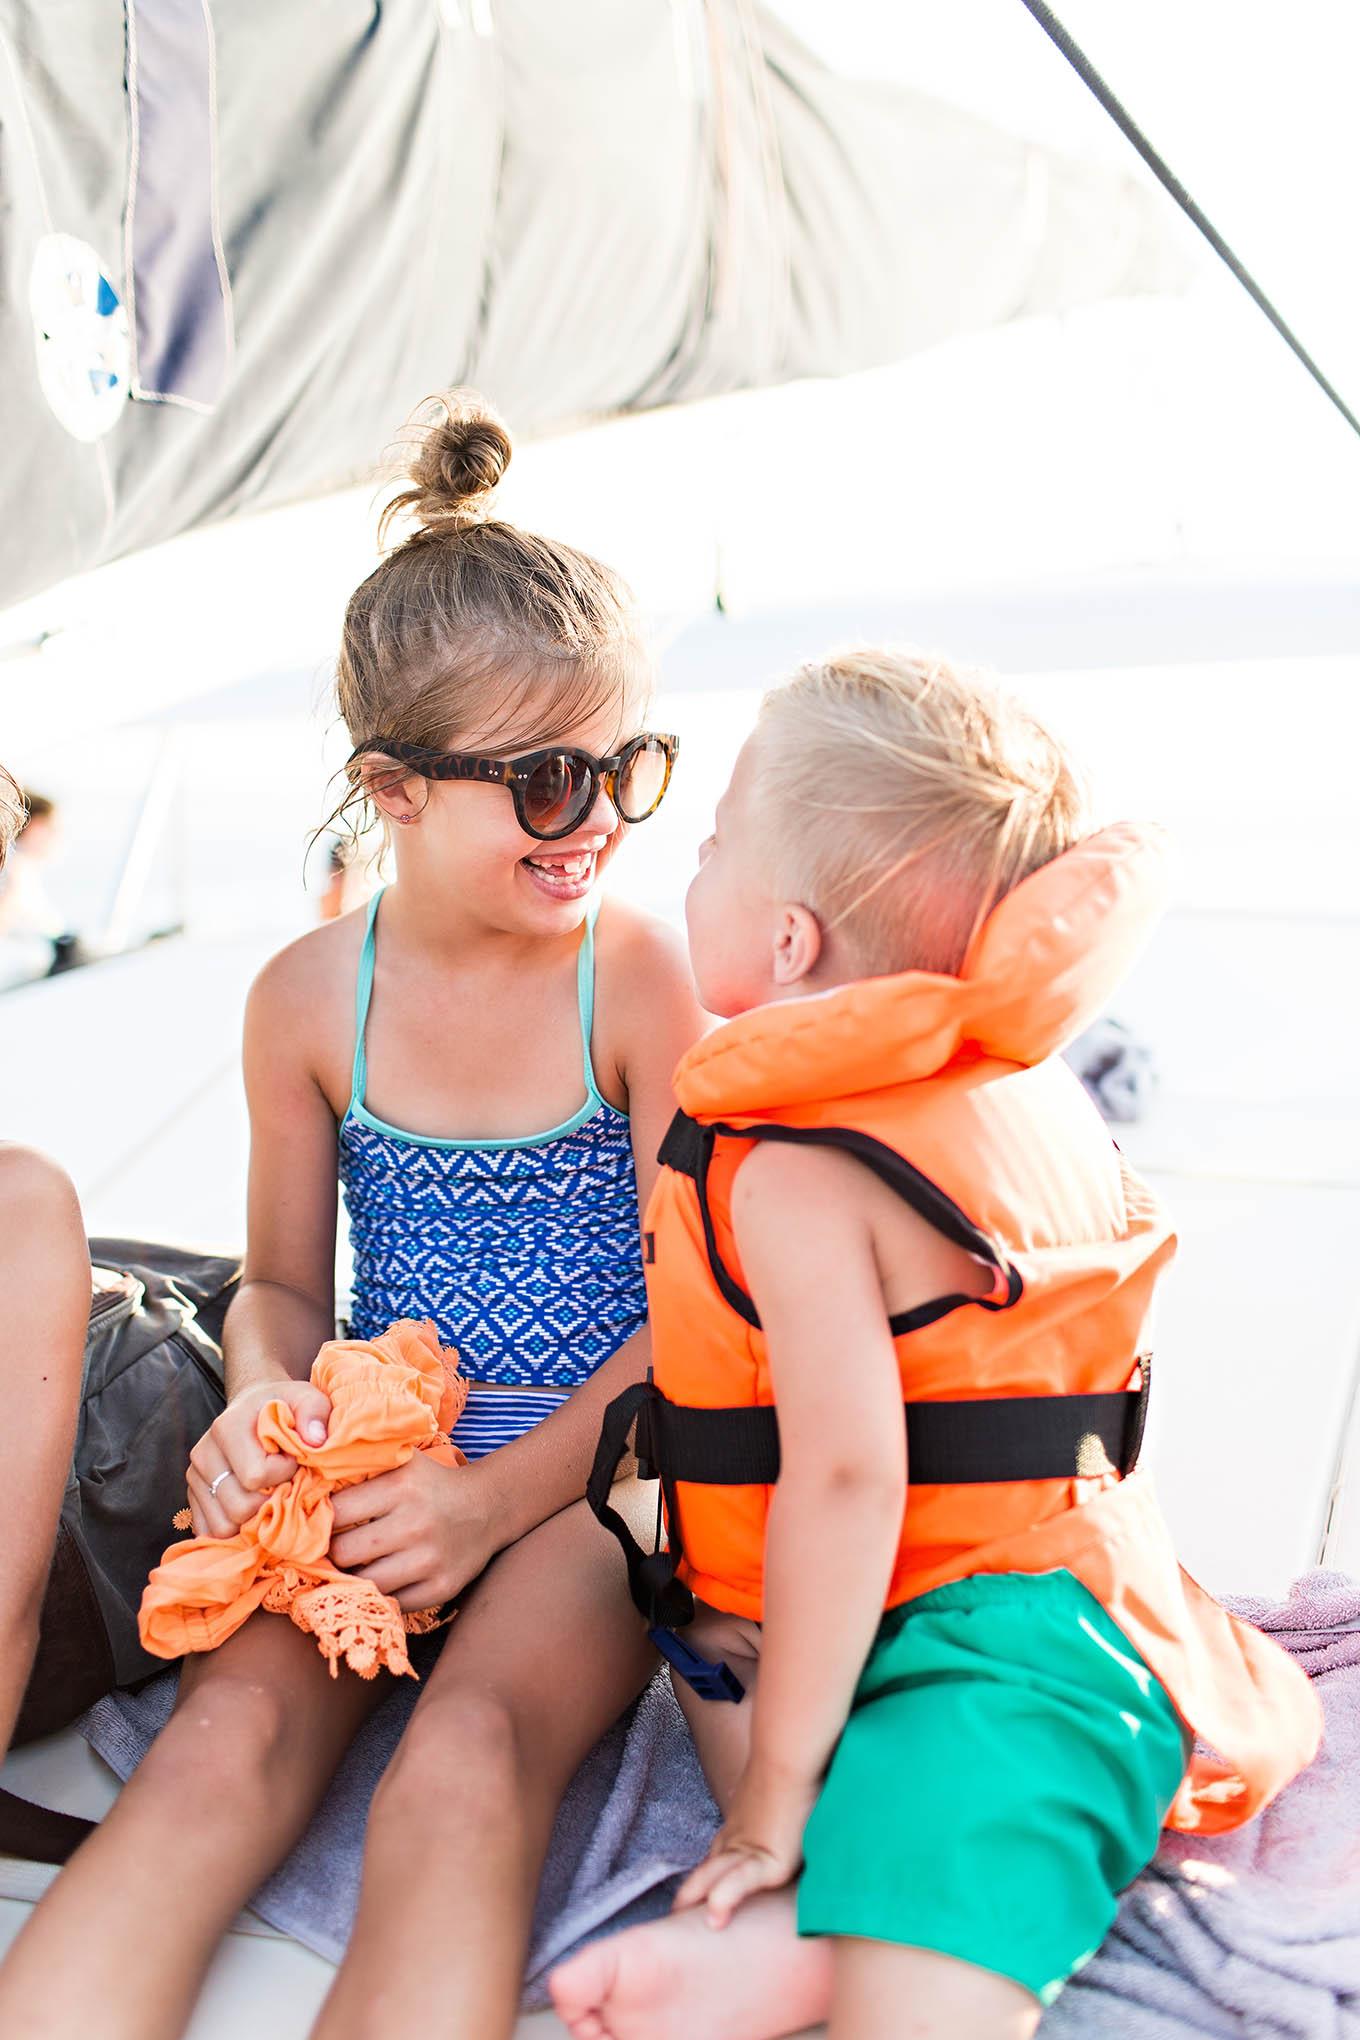 Beckam and Mara Greece Hello Fashion Blog